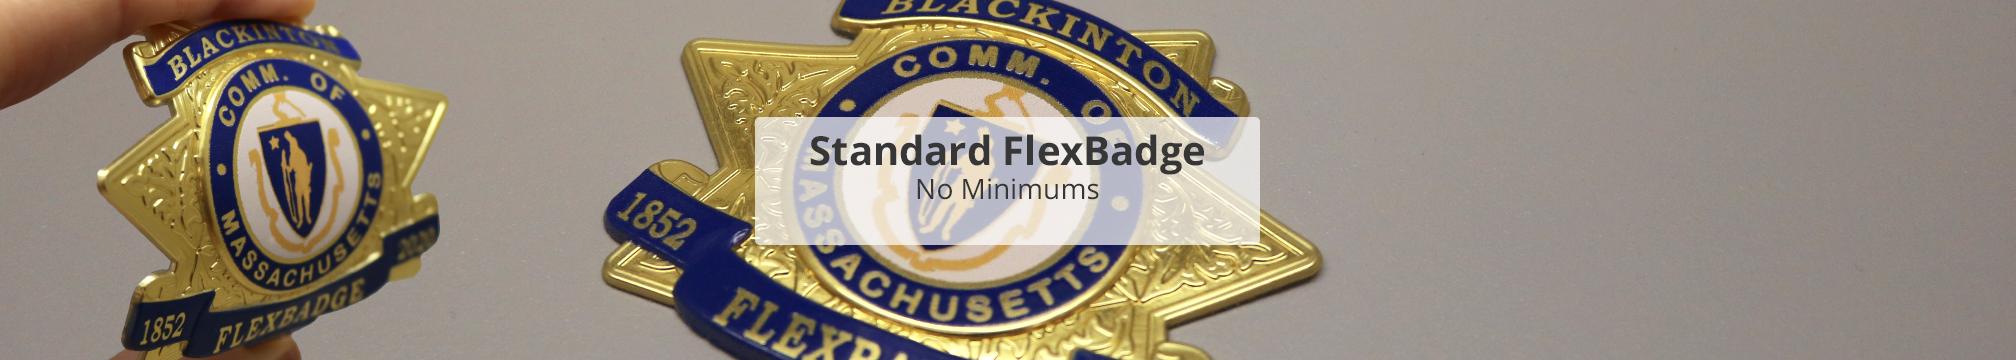 Standard 3d metallic emblem flexbadge